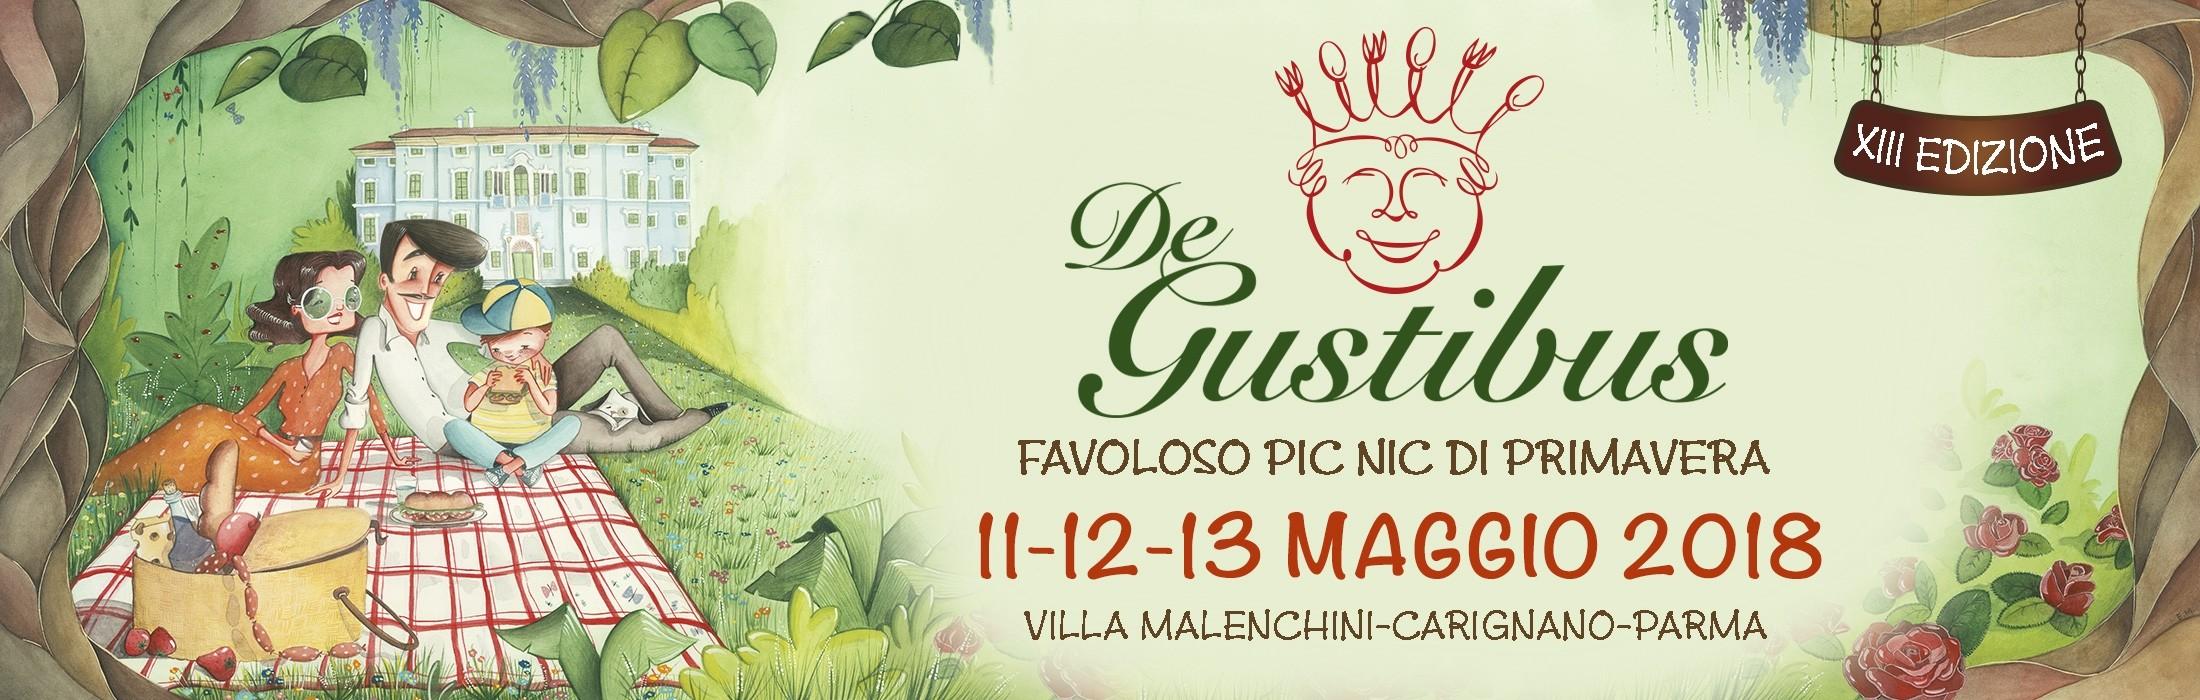 De Gustibus Il giardino del gusto